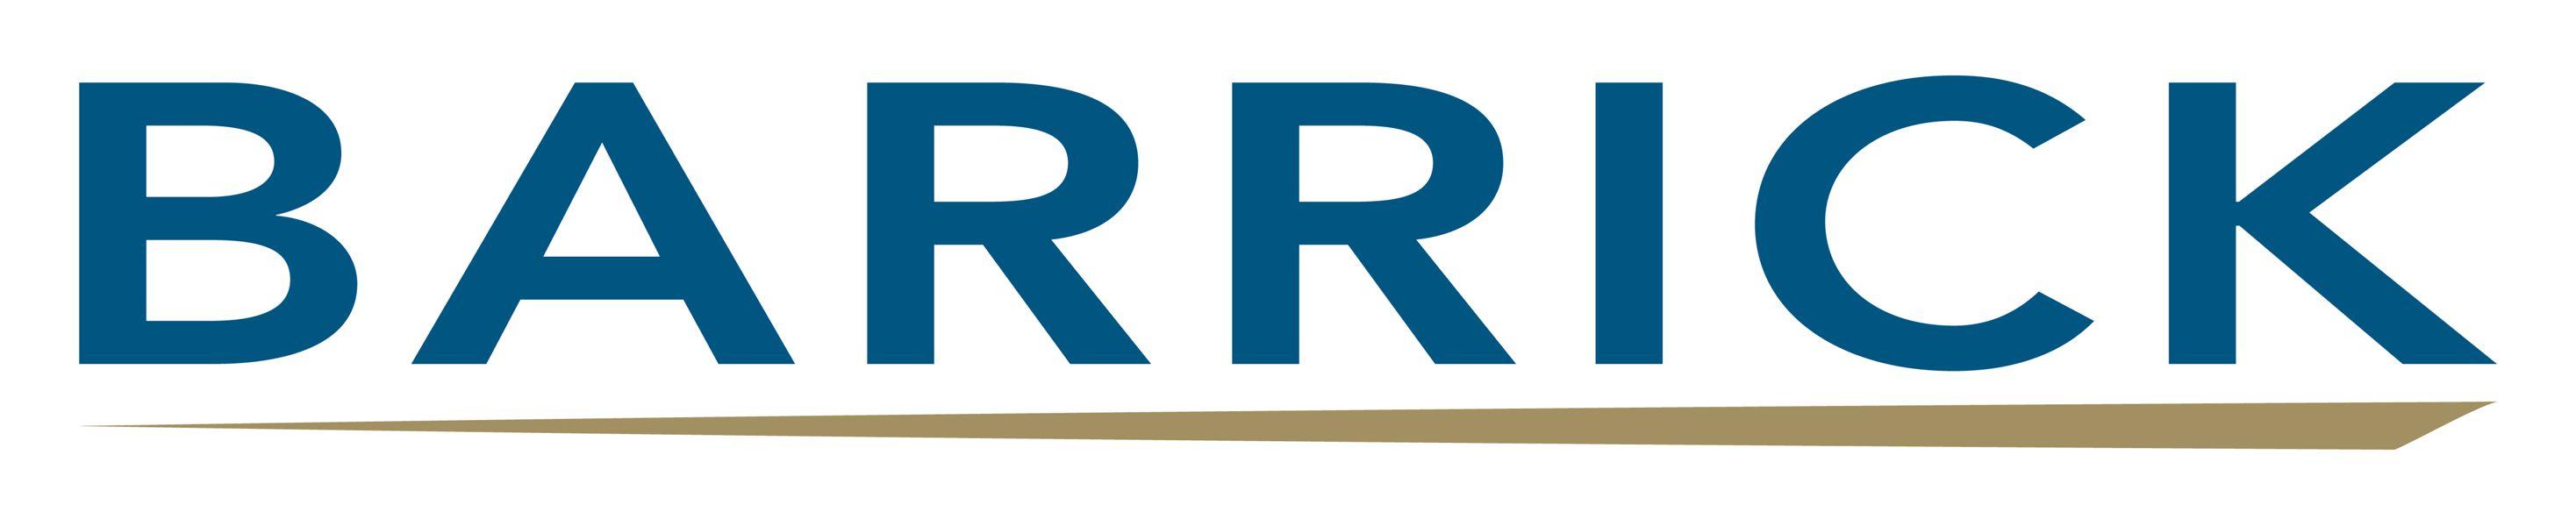 Barrick Gold Corporation: Morila Sale Concluded